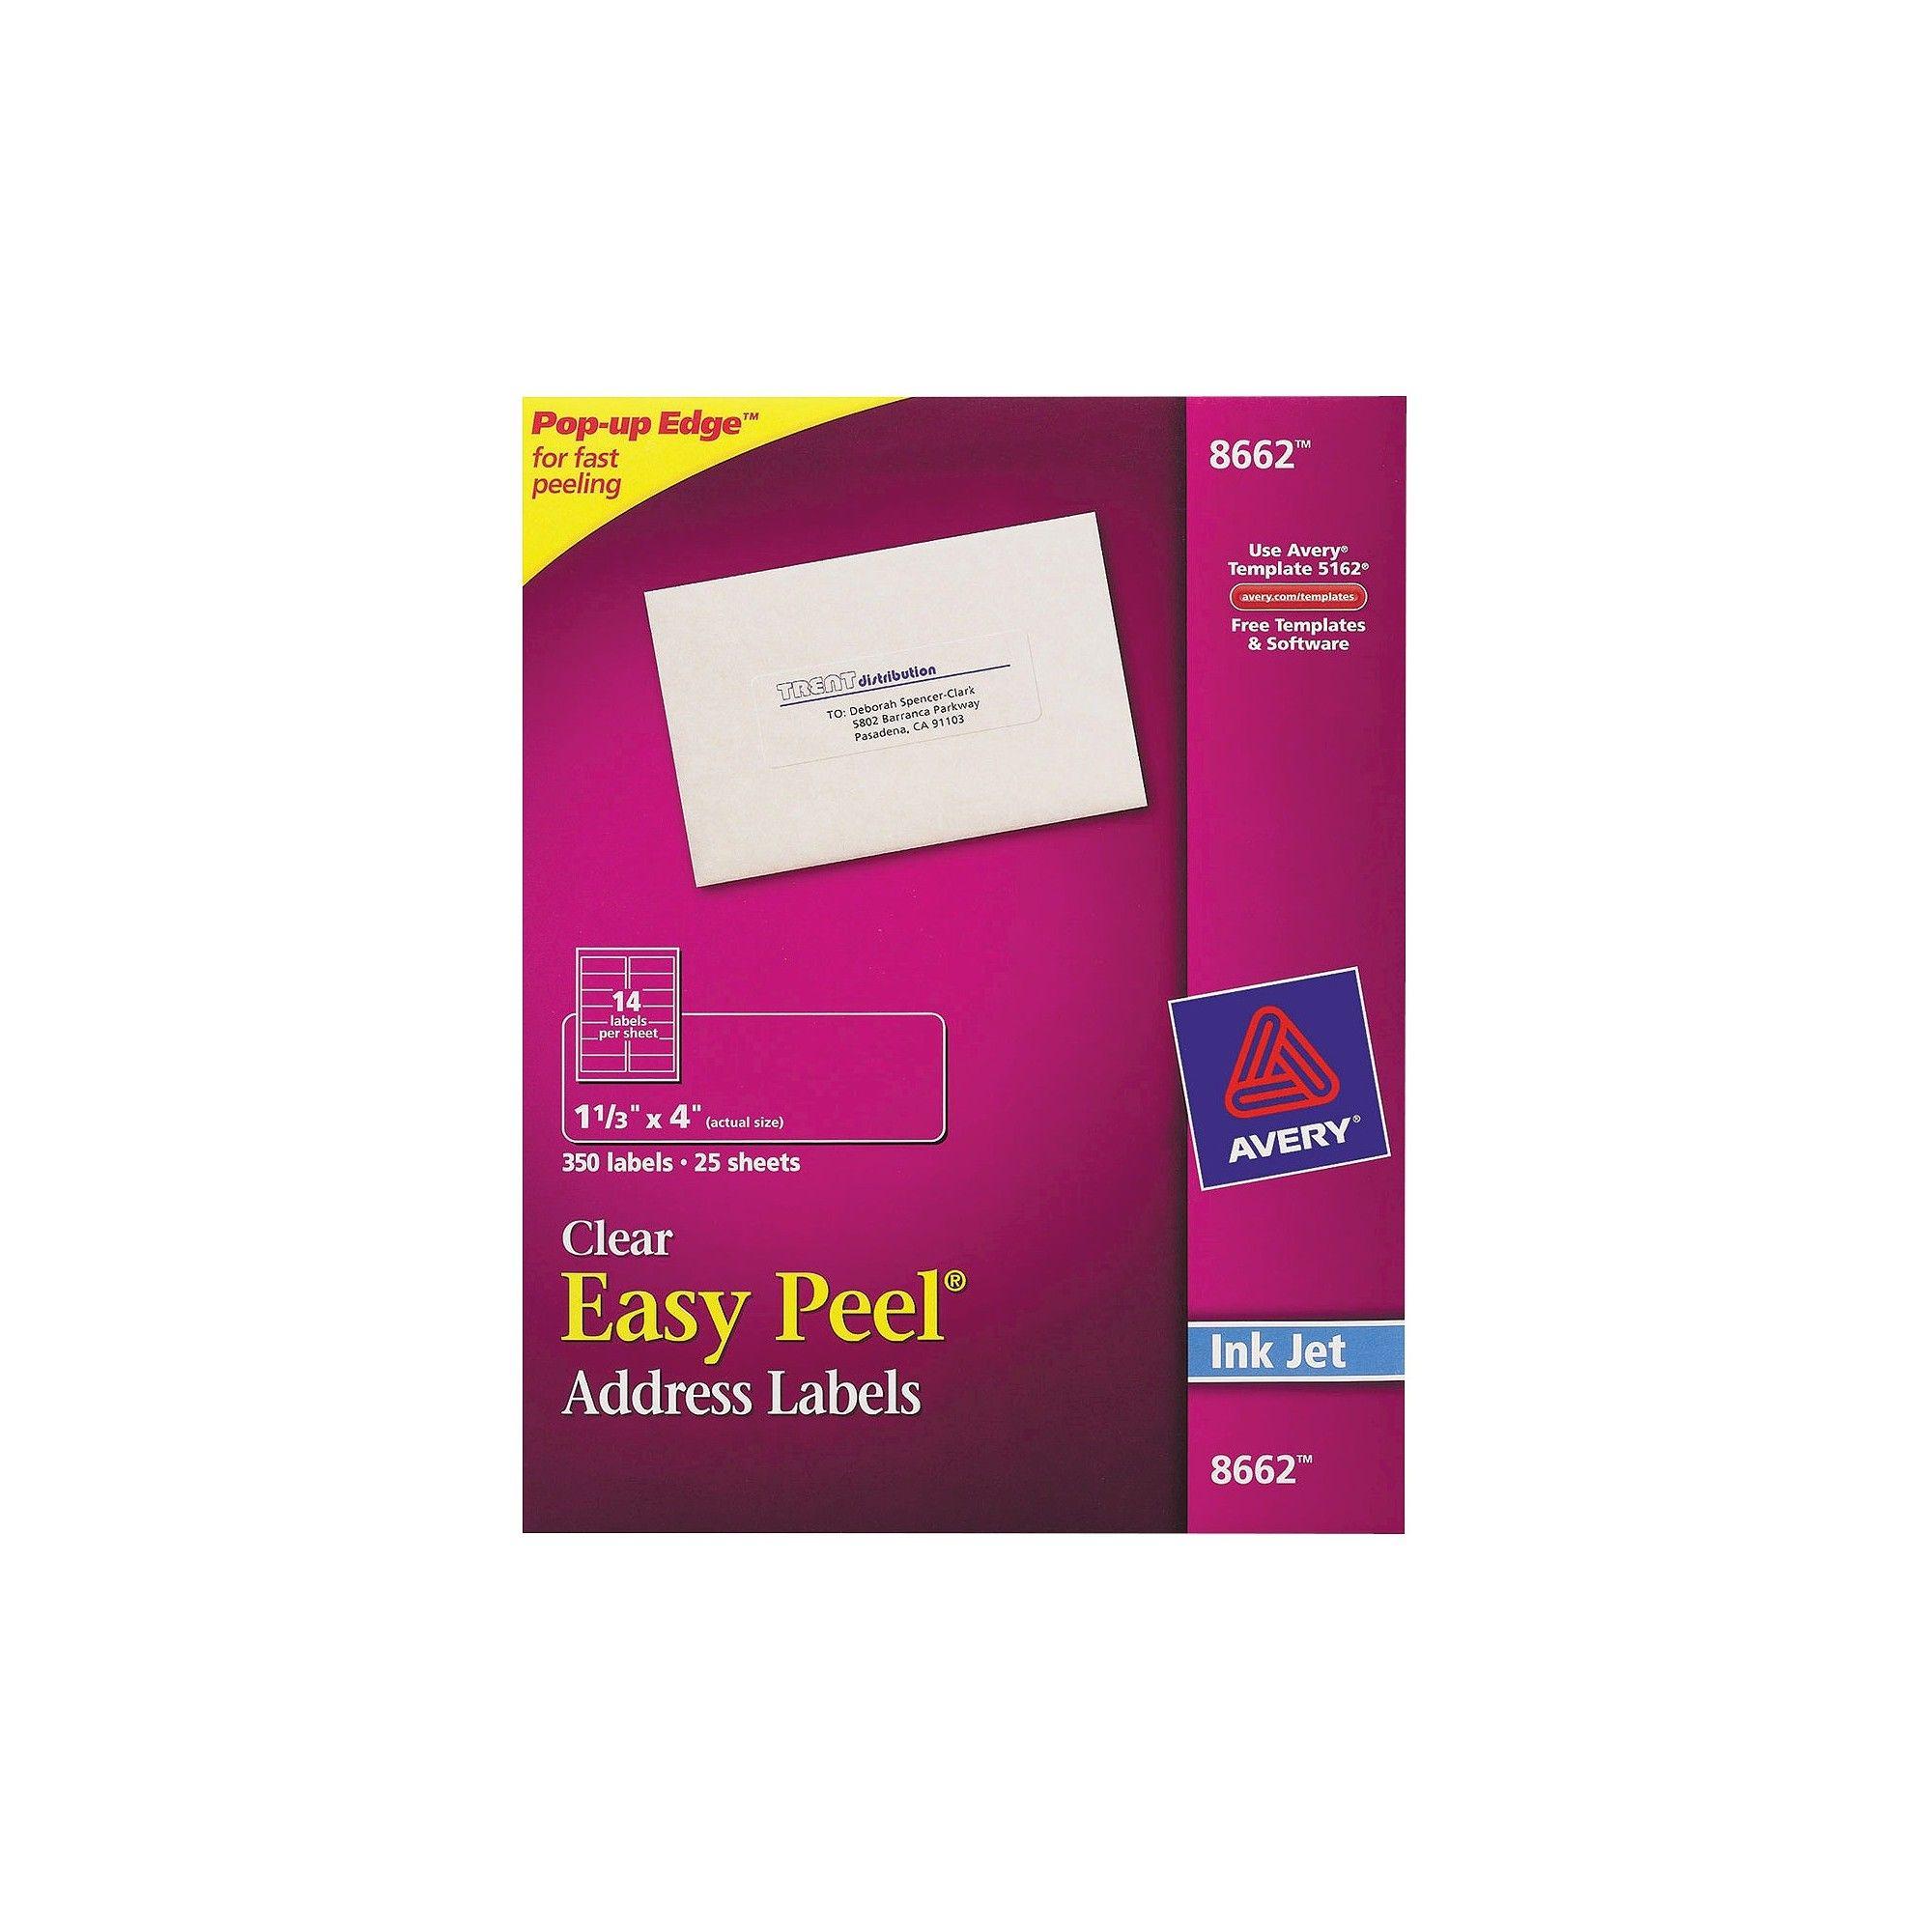 Avery 08662, Clear Easy Peel Mailing Labels, Inkjet, 1 1/3 x 4, 350pk